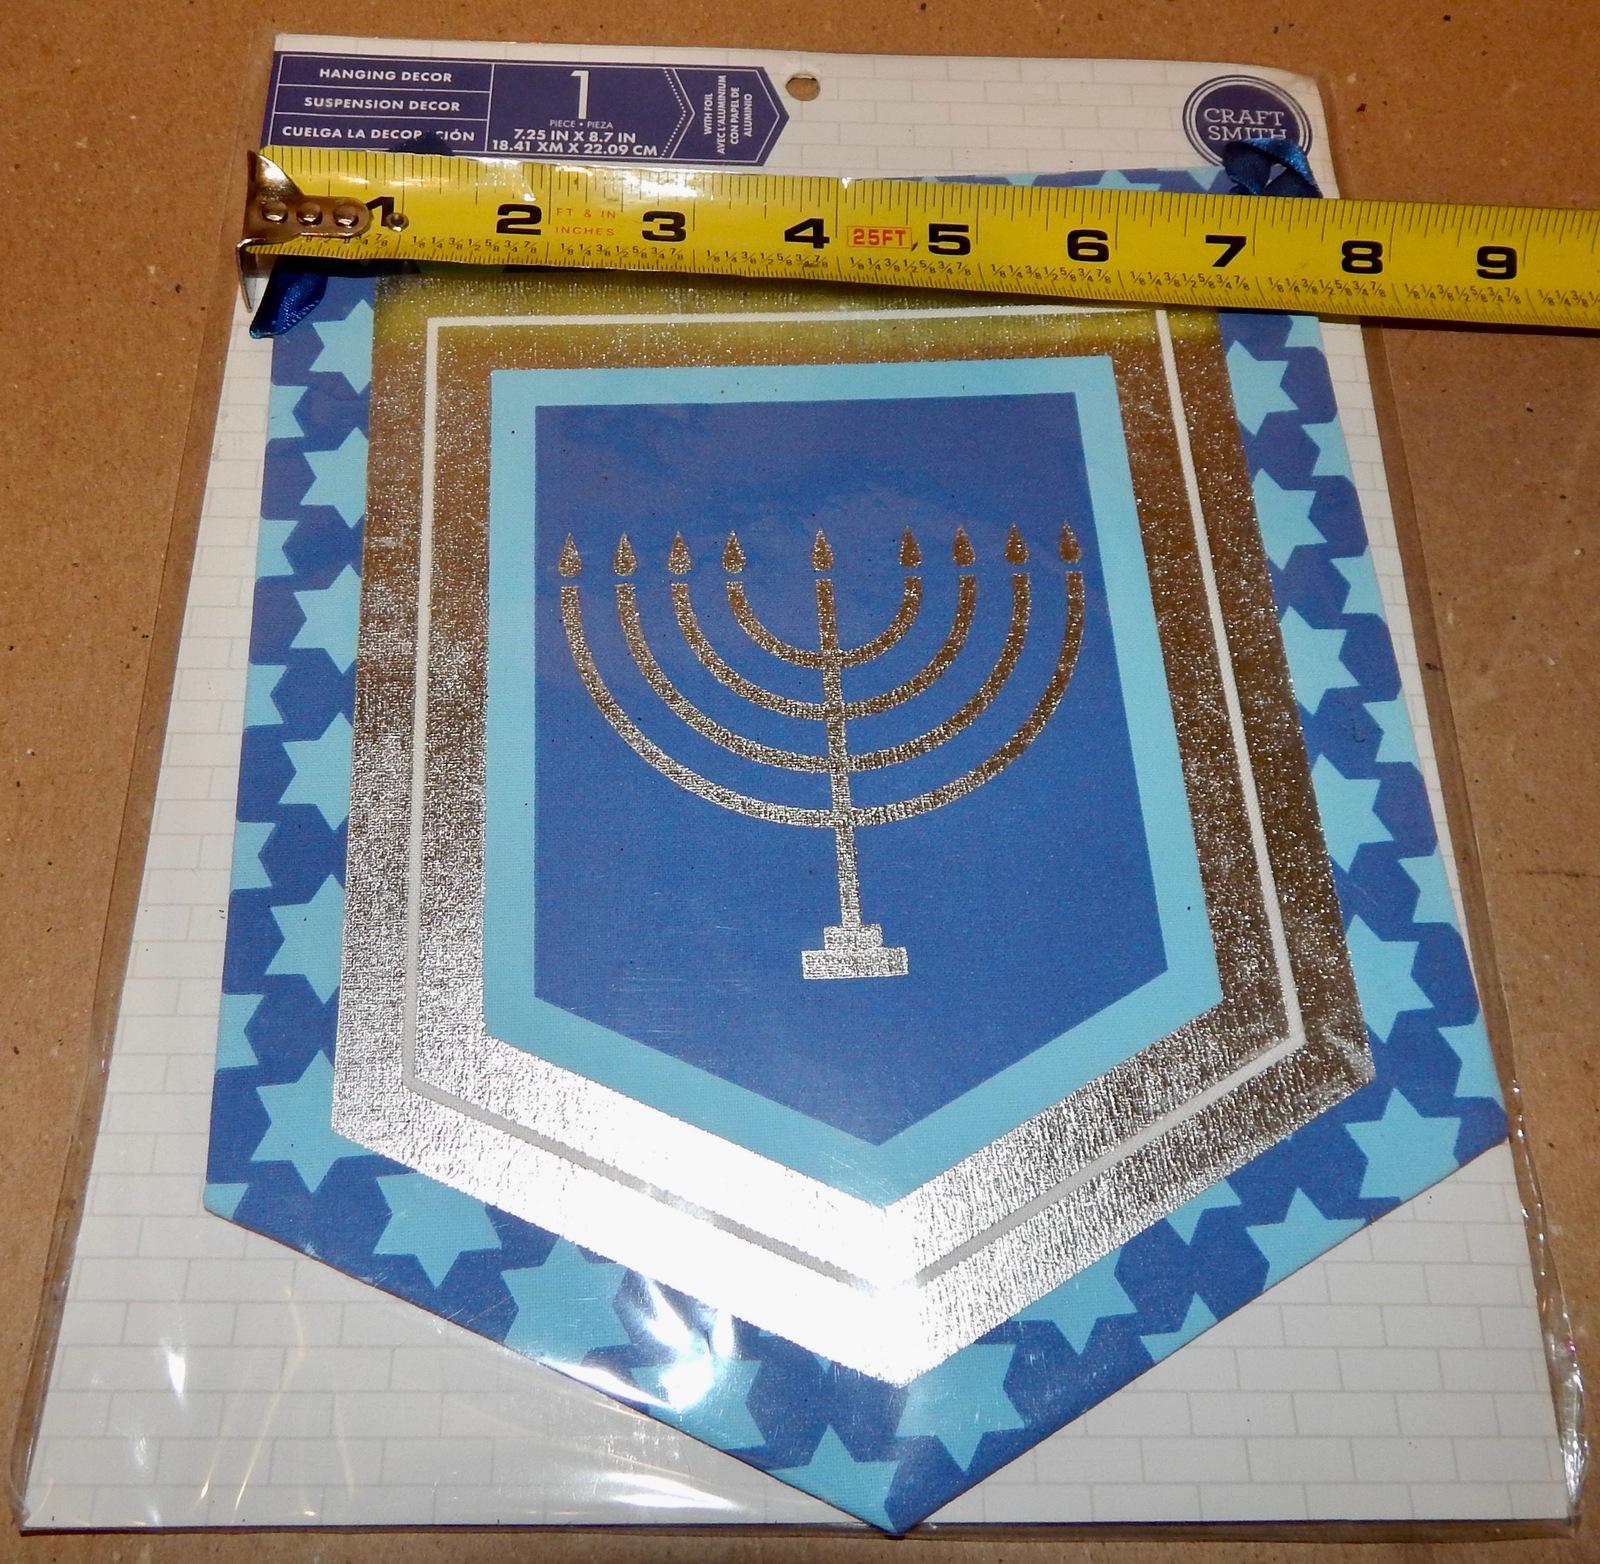 "Christmas Hanging Decor 7 1/4"" x 8 1/2"" Hanukkah Candle Sign Craft Smith 175P"